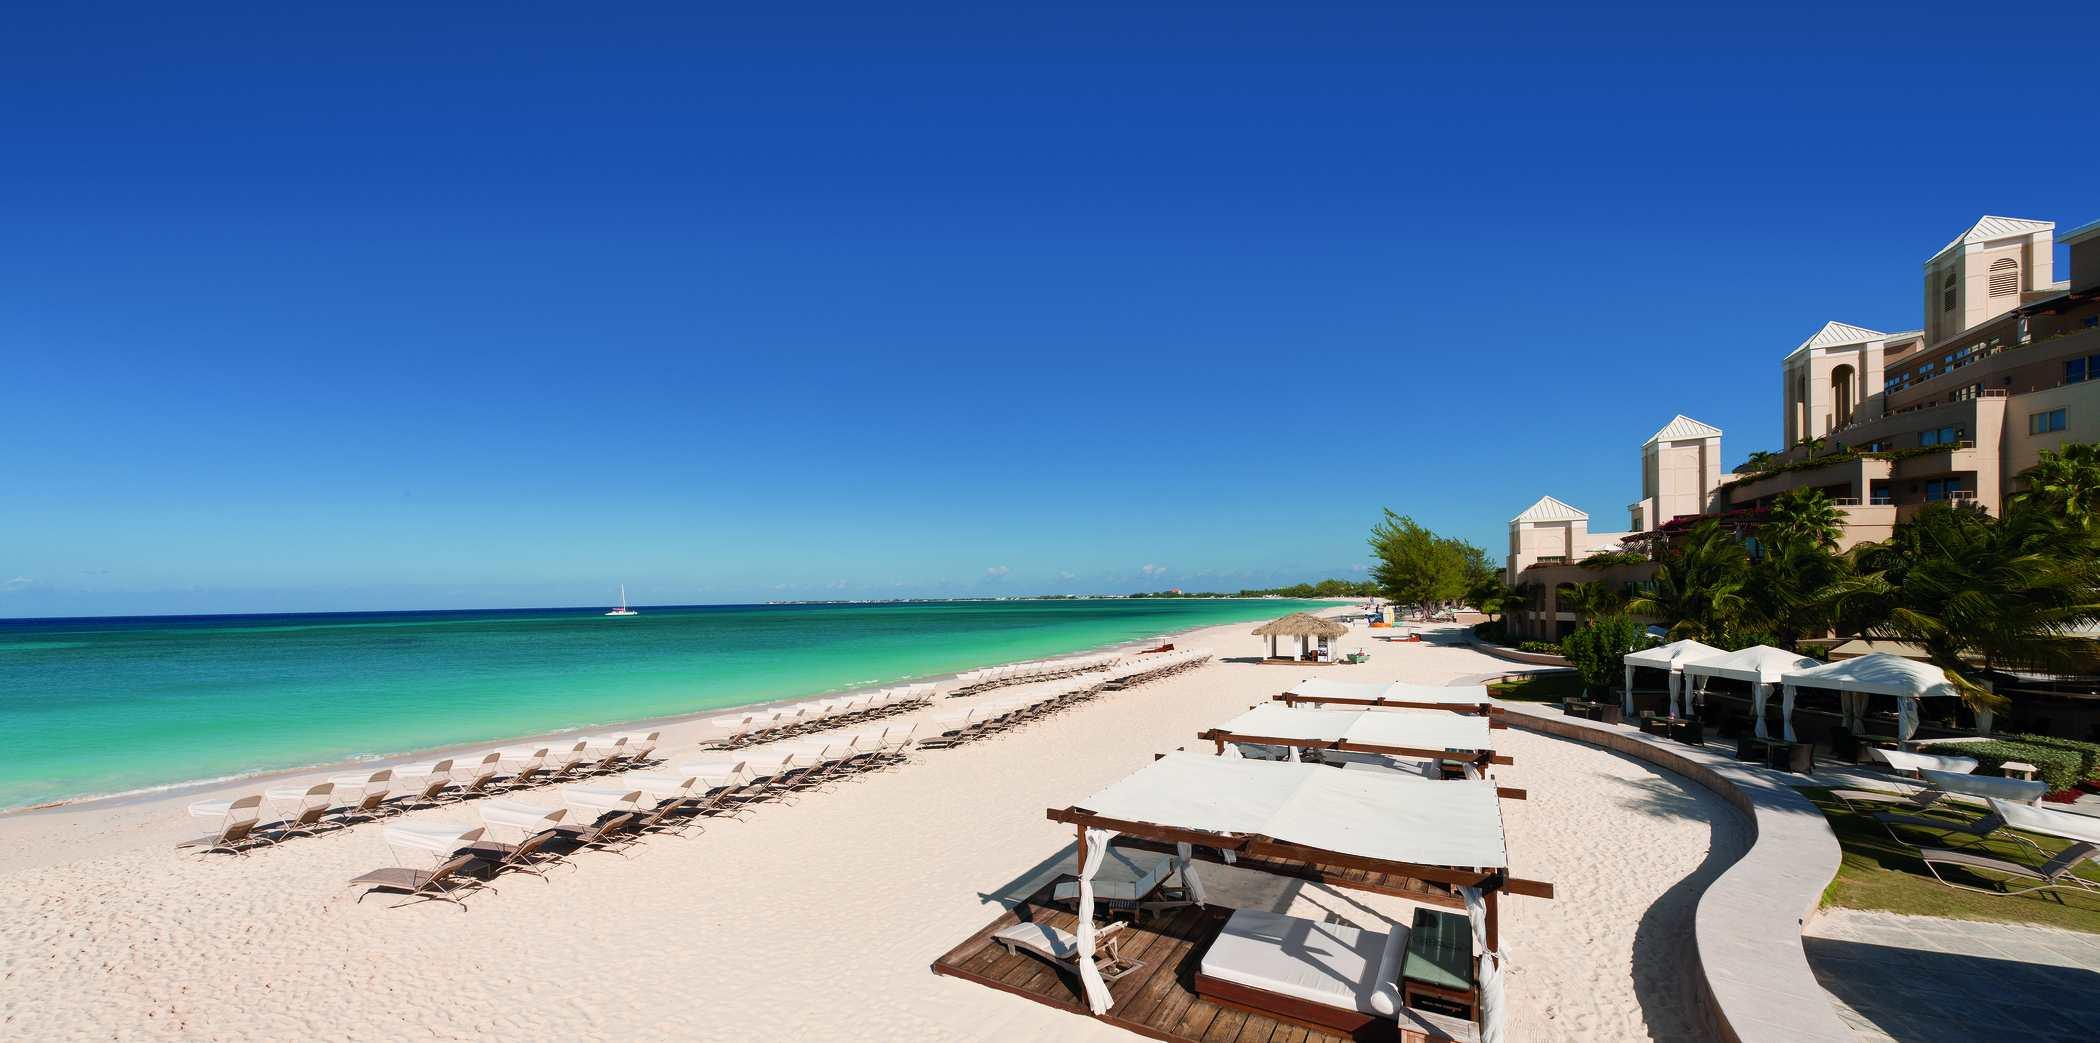 La playa en Ritz-Carlton Gran Caimán